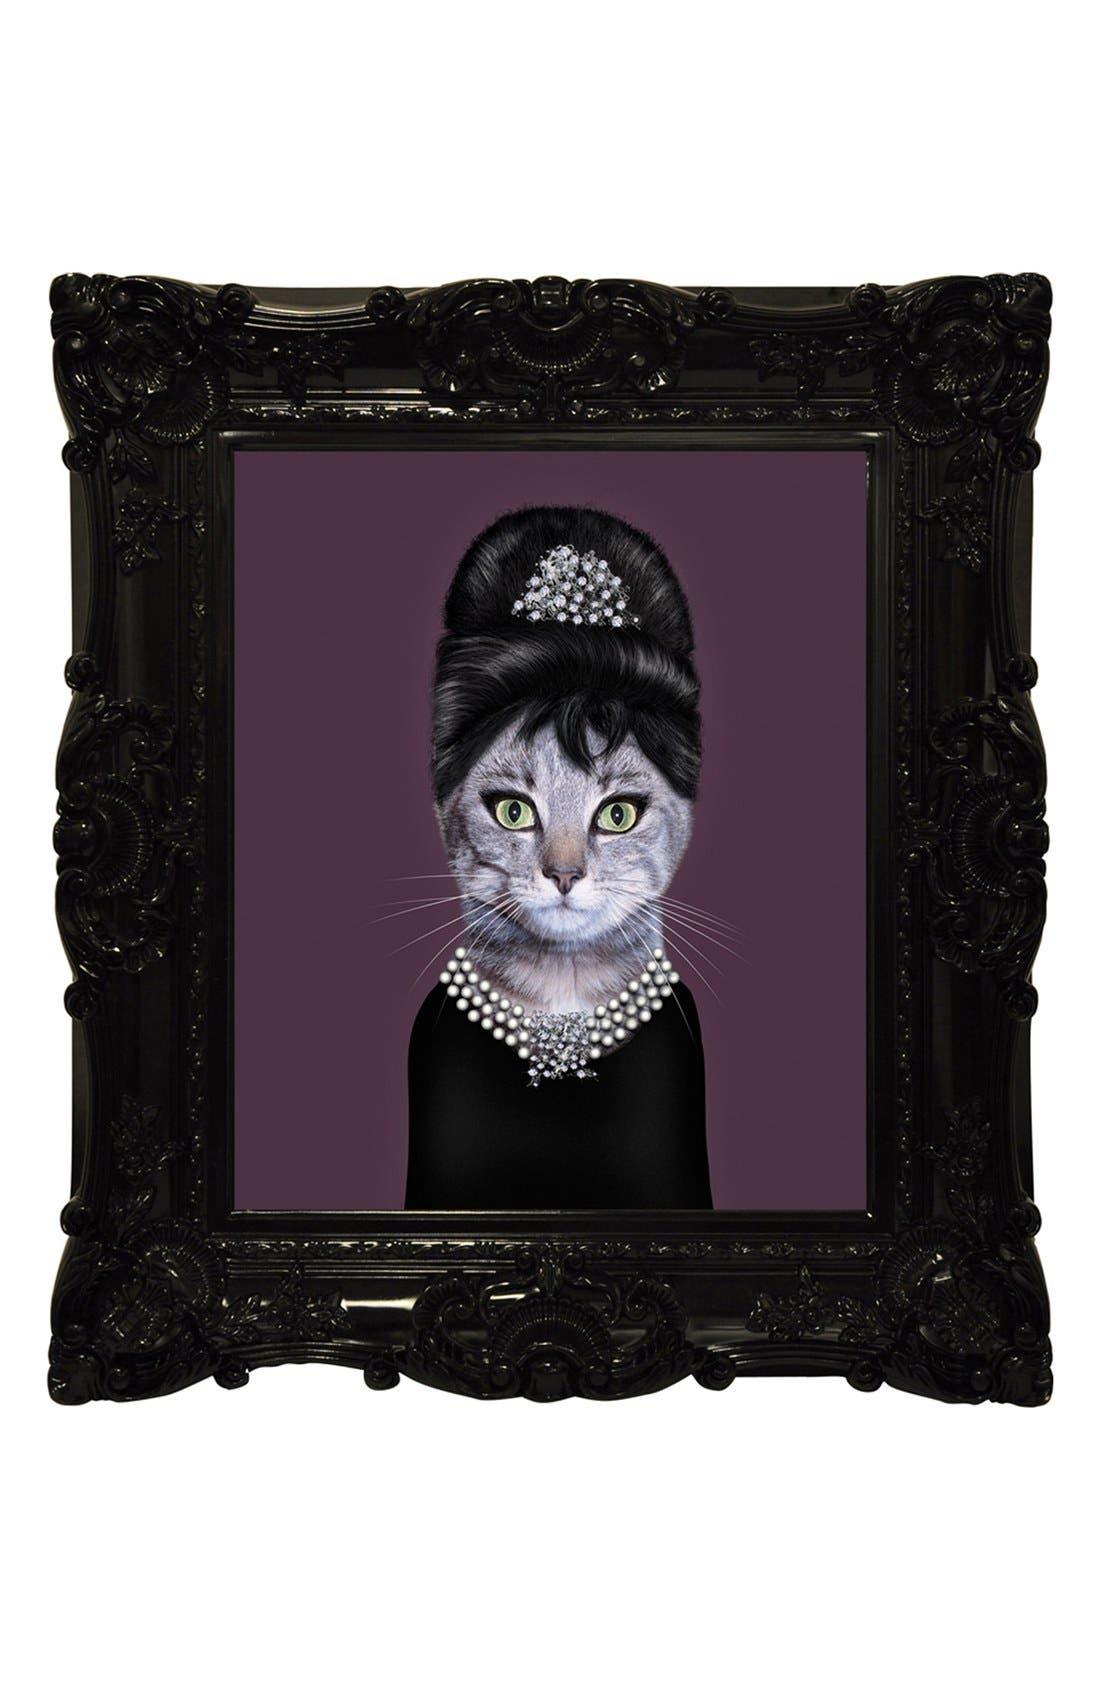 Alternate Image 1 Selected - Empire Art Direct 'Pets Rock™ - Breakfast' Framed Wall Art